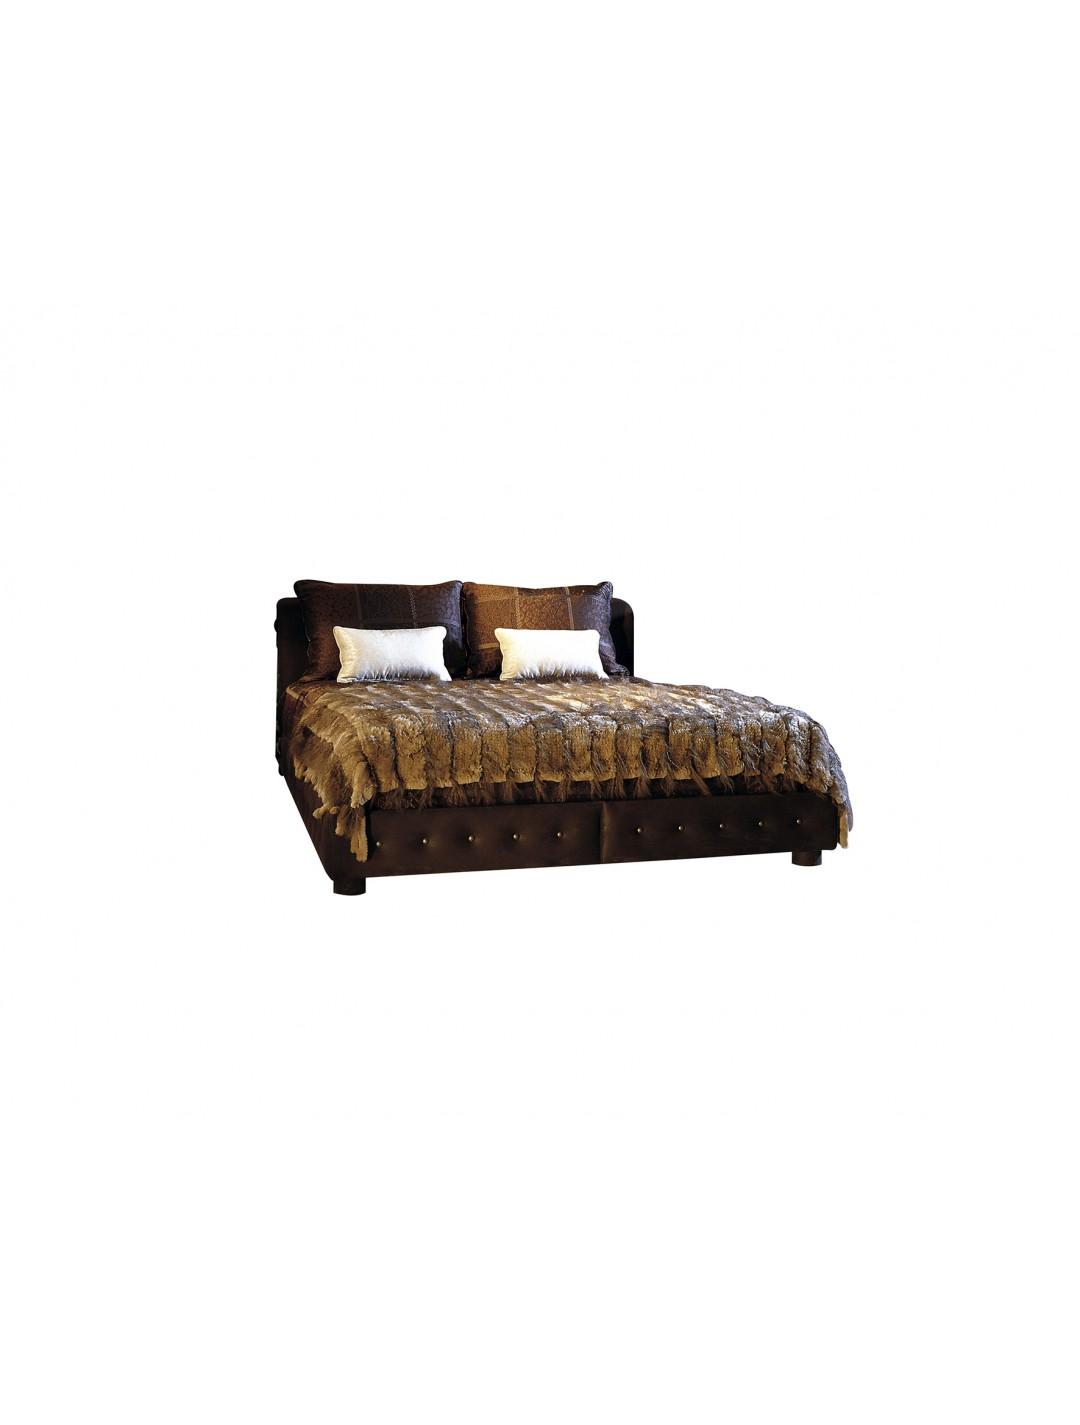 VICTORIA BED (FOR 150X190 CM MATTRESS)